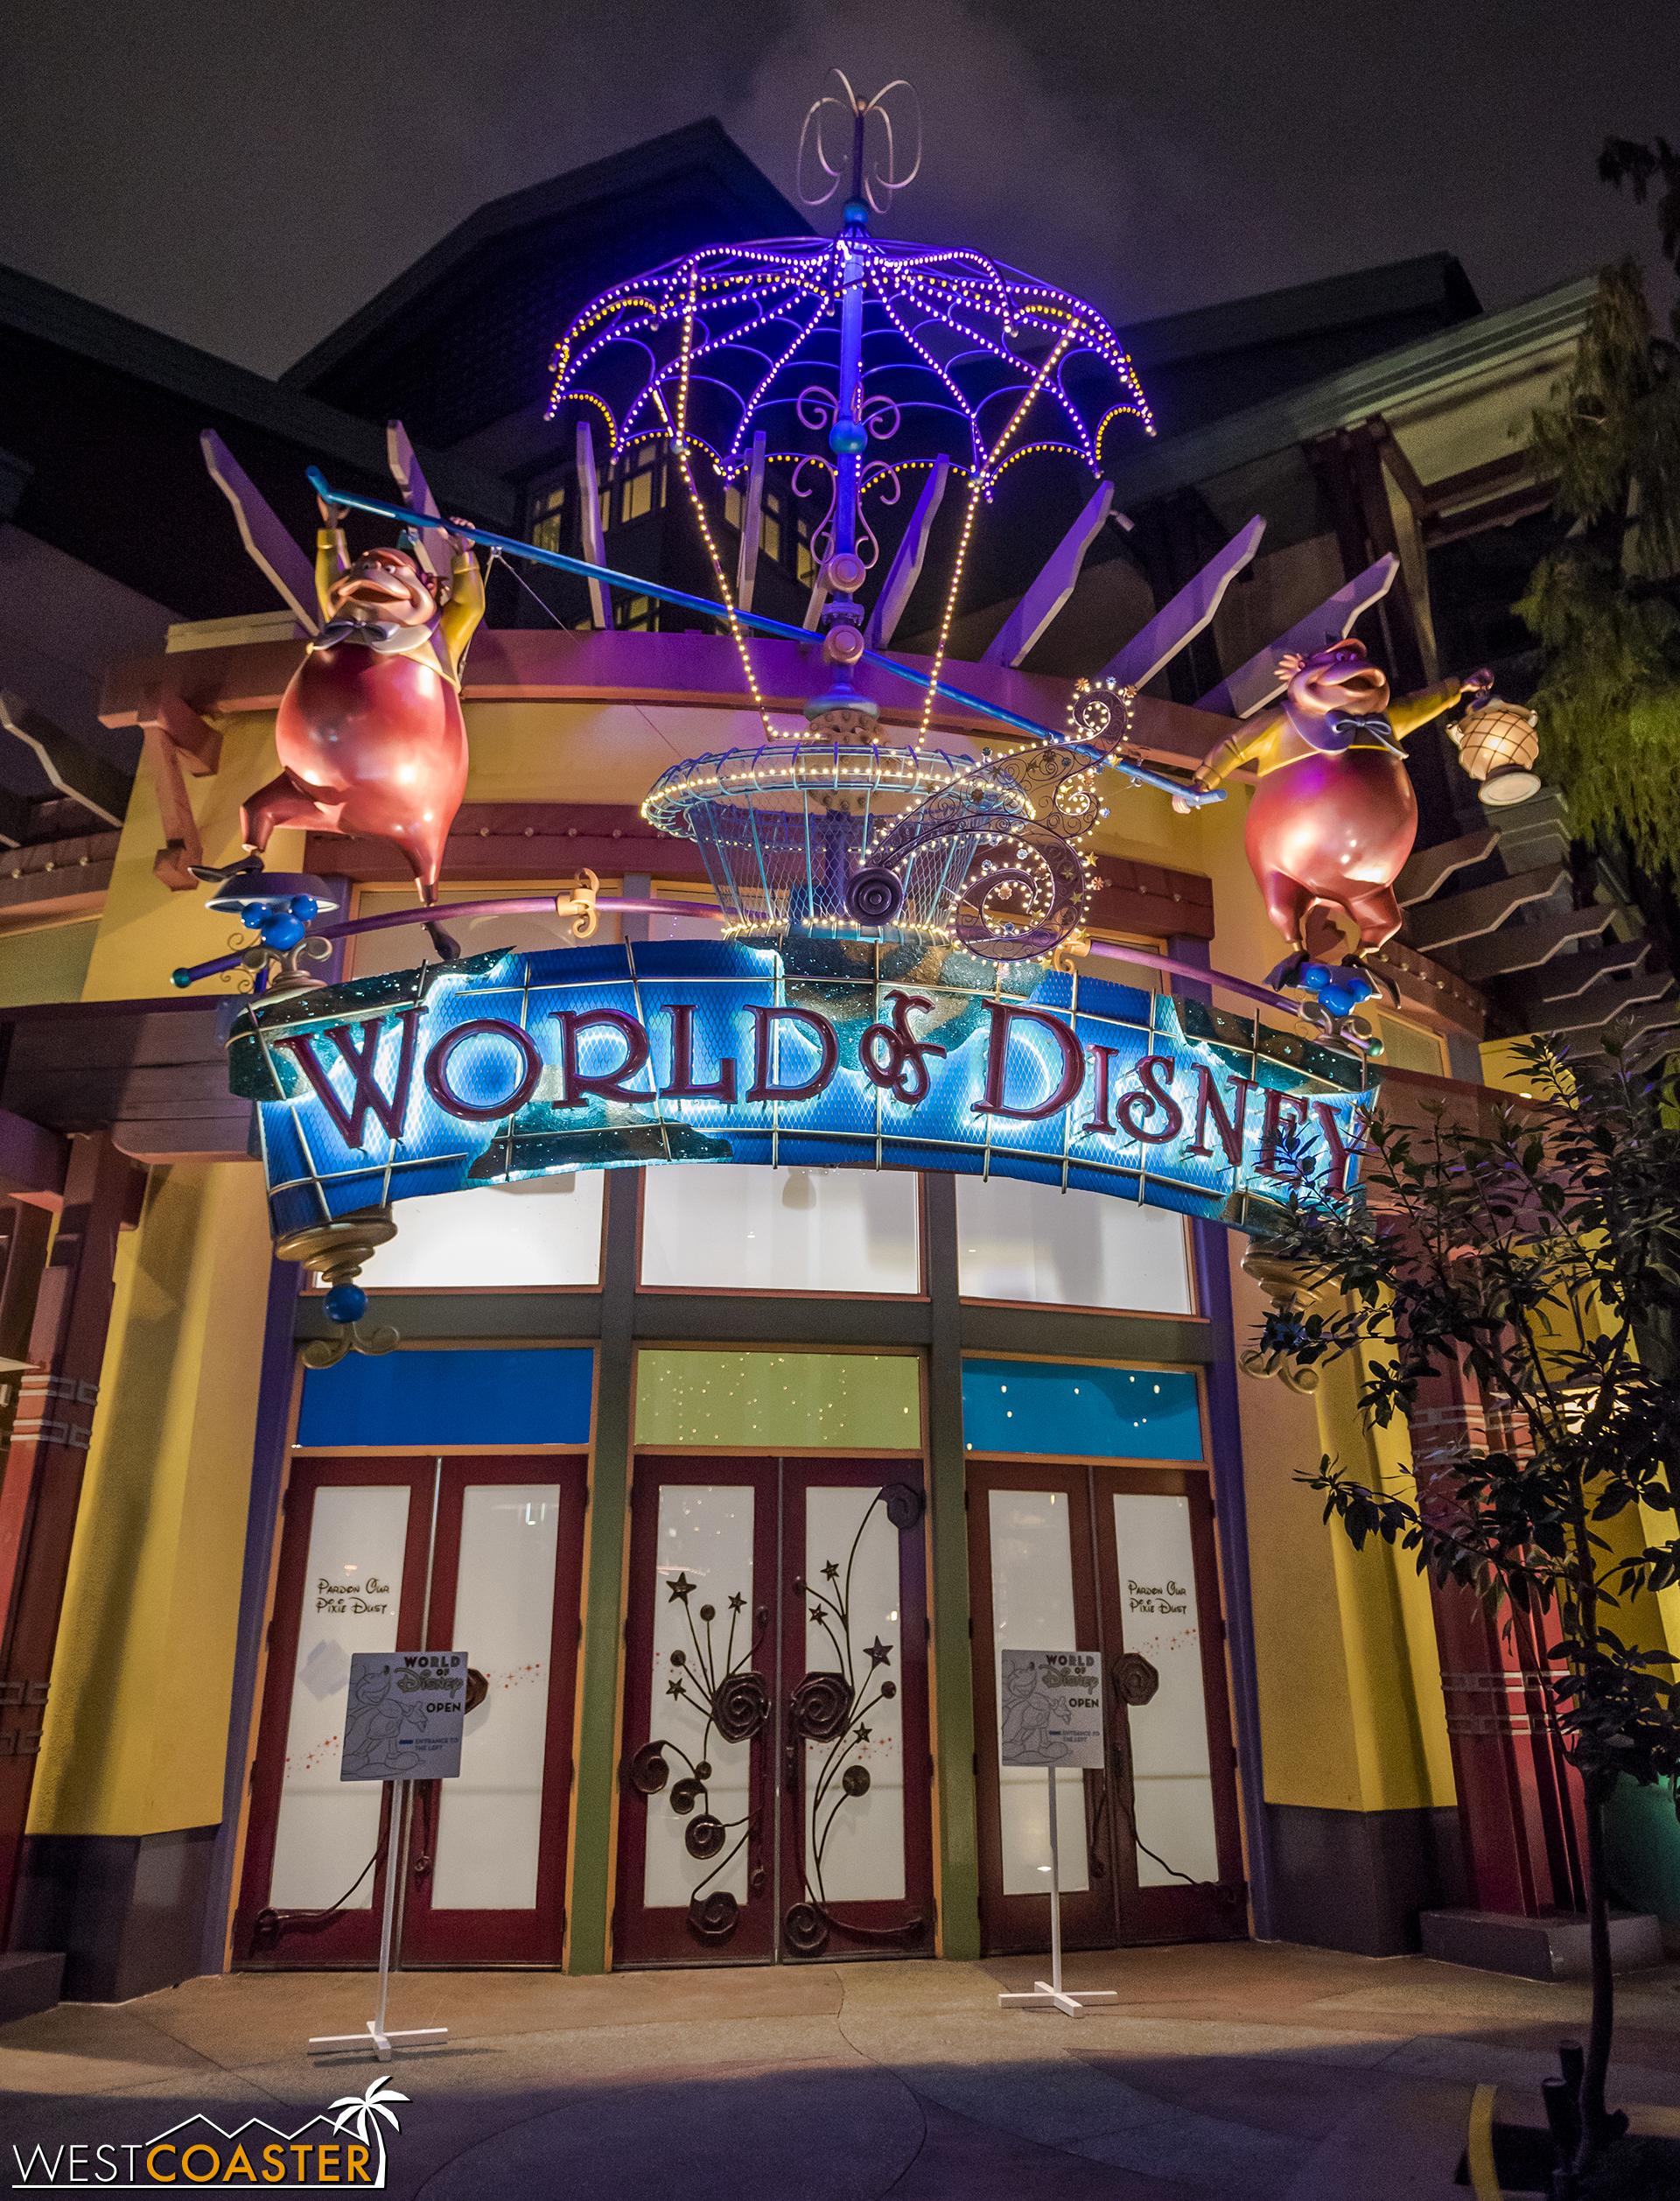 So for now, enter World of Disney from the La Brea Bakery side, not the Starbucks side.